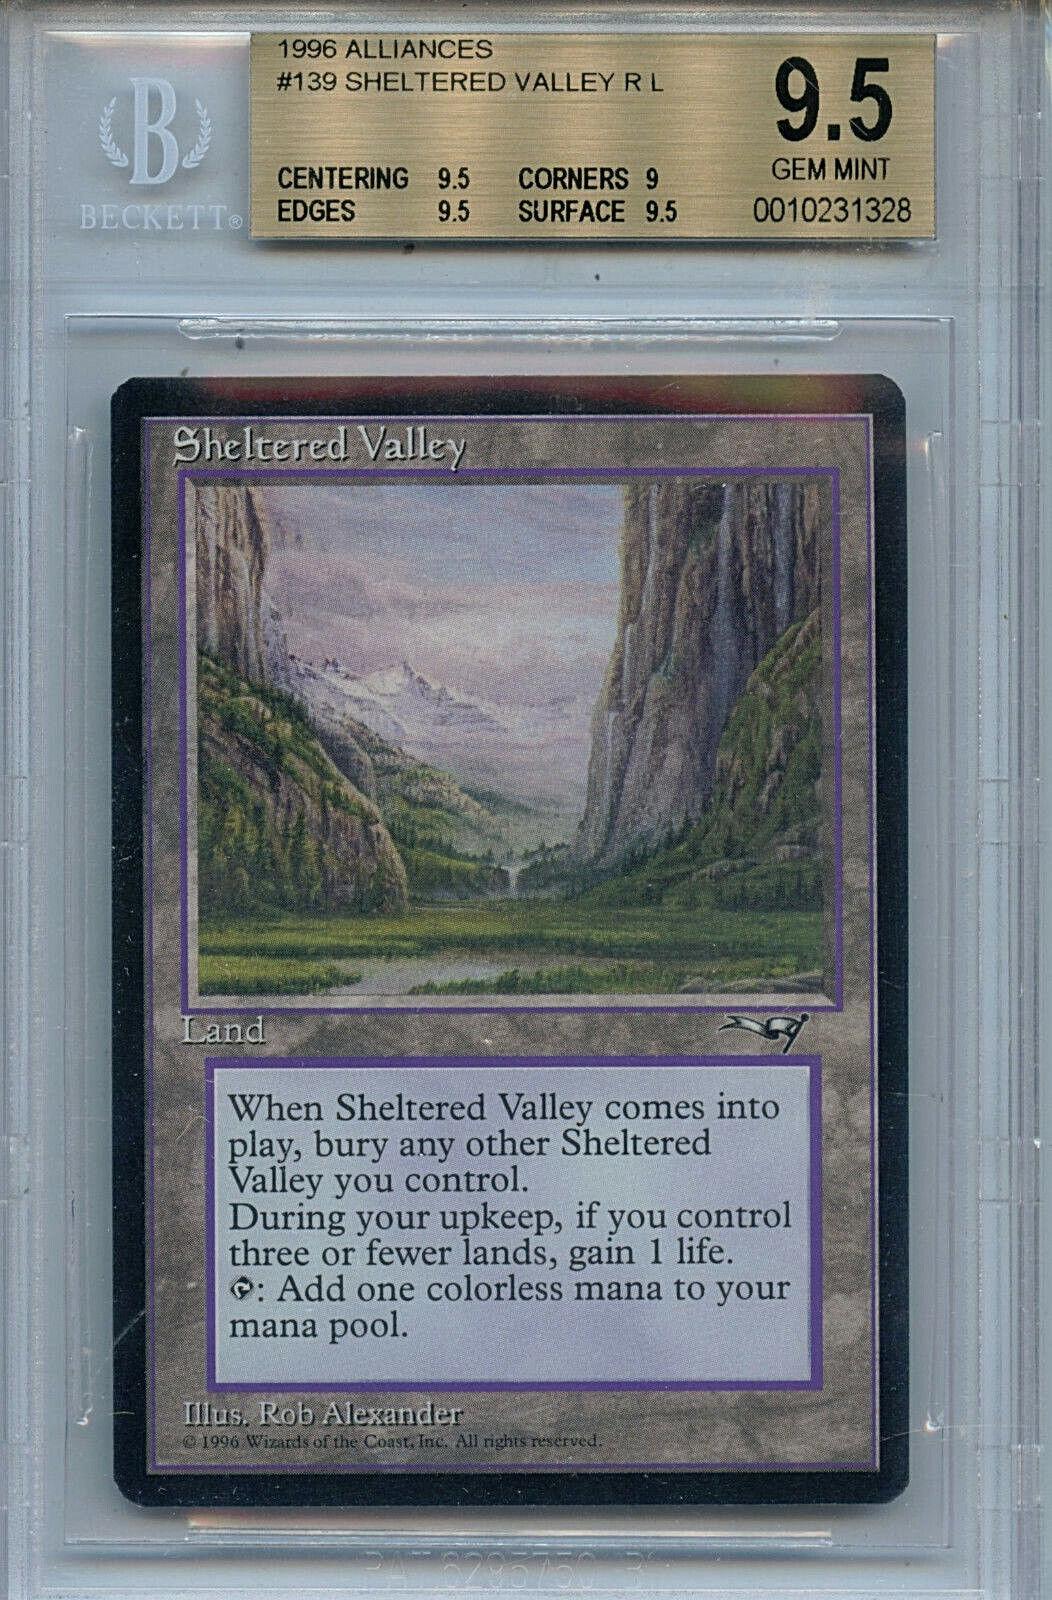 MTG Sheltered Valley BGS 9.5 Gem Mint Alliances Magic Card Amricons1328